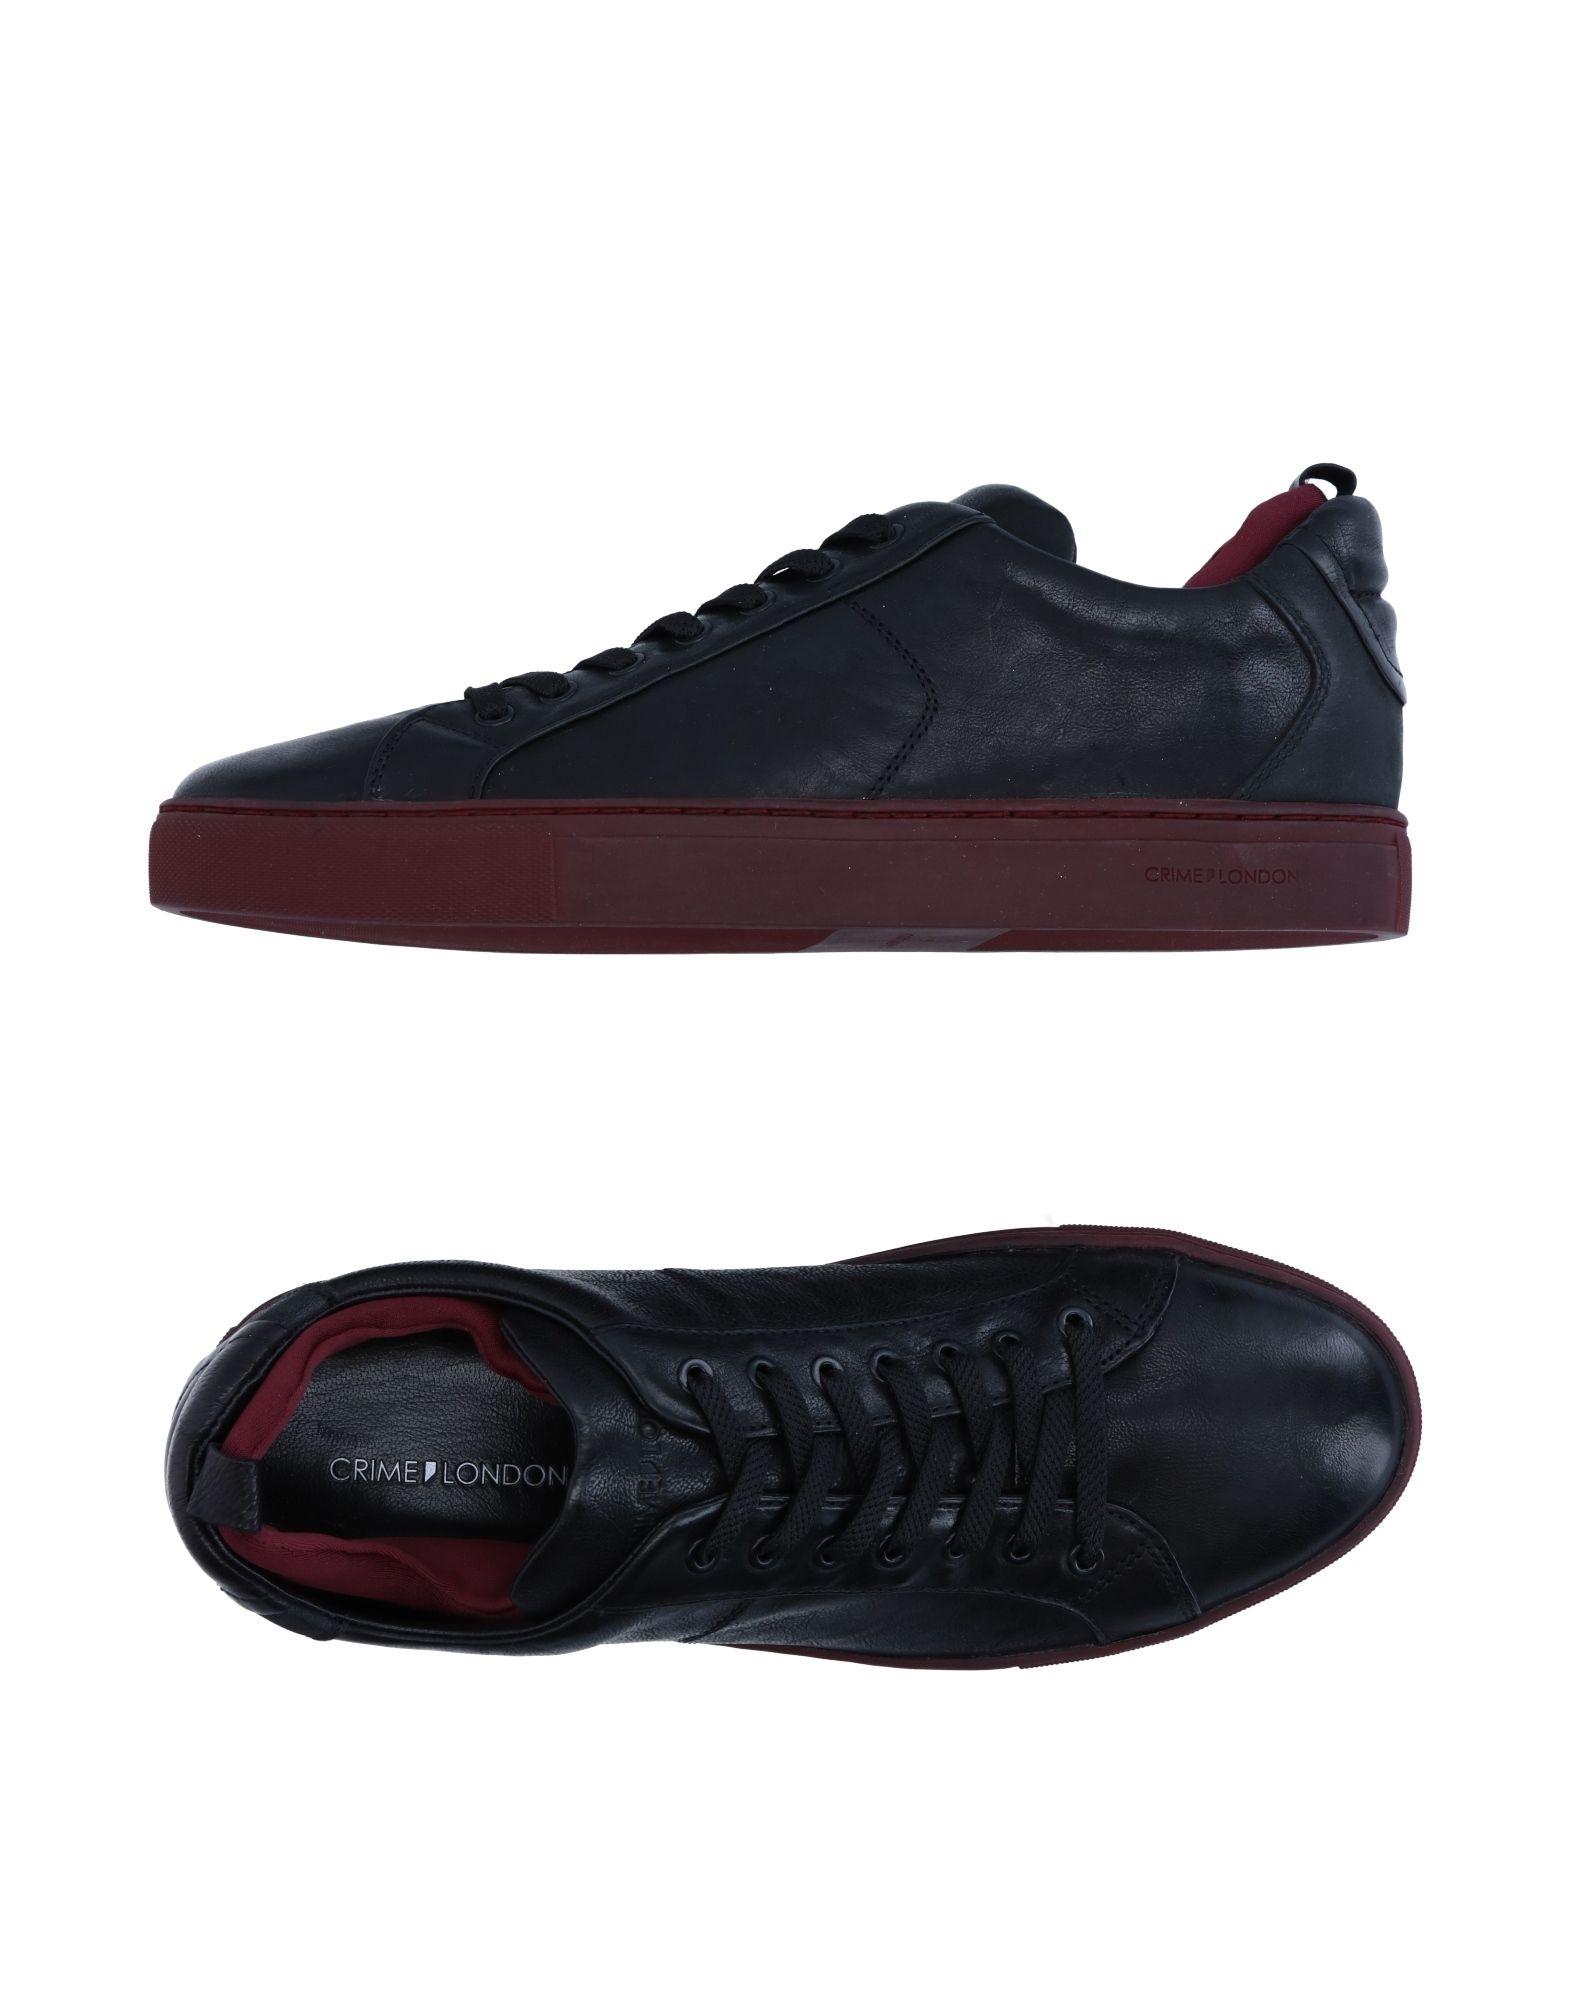 London Crime London  Sneakers Herren  11249977LO a824ca